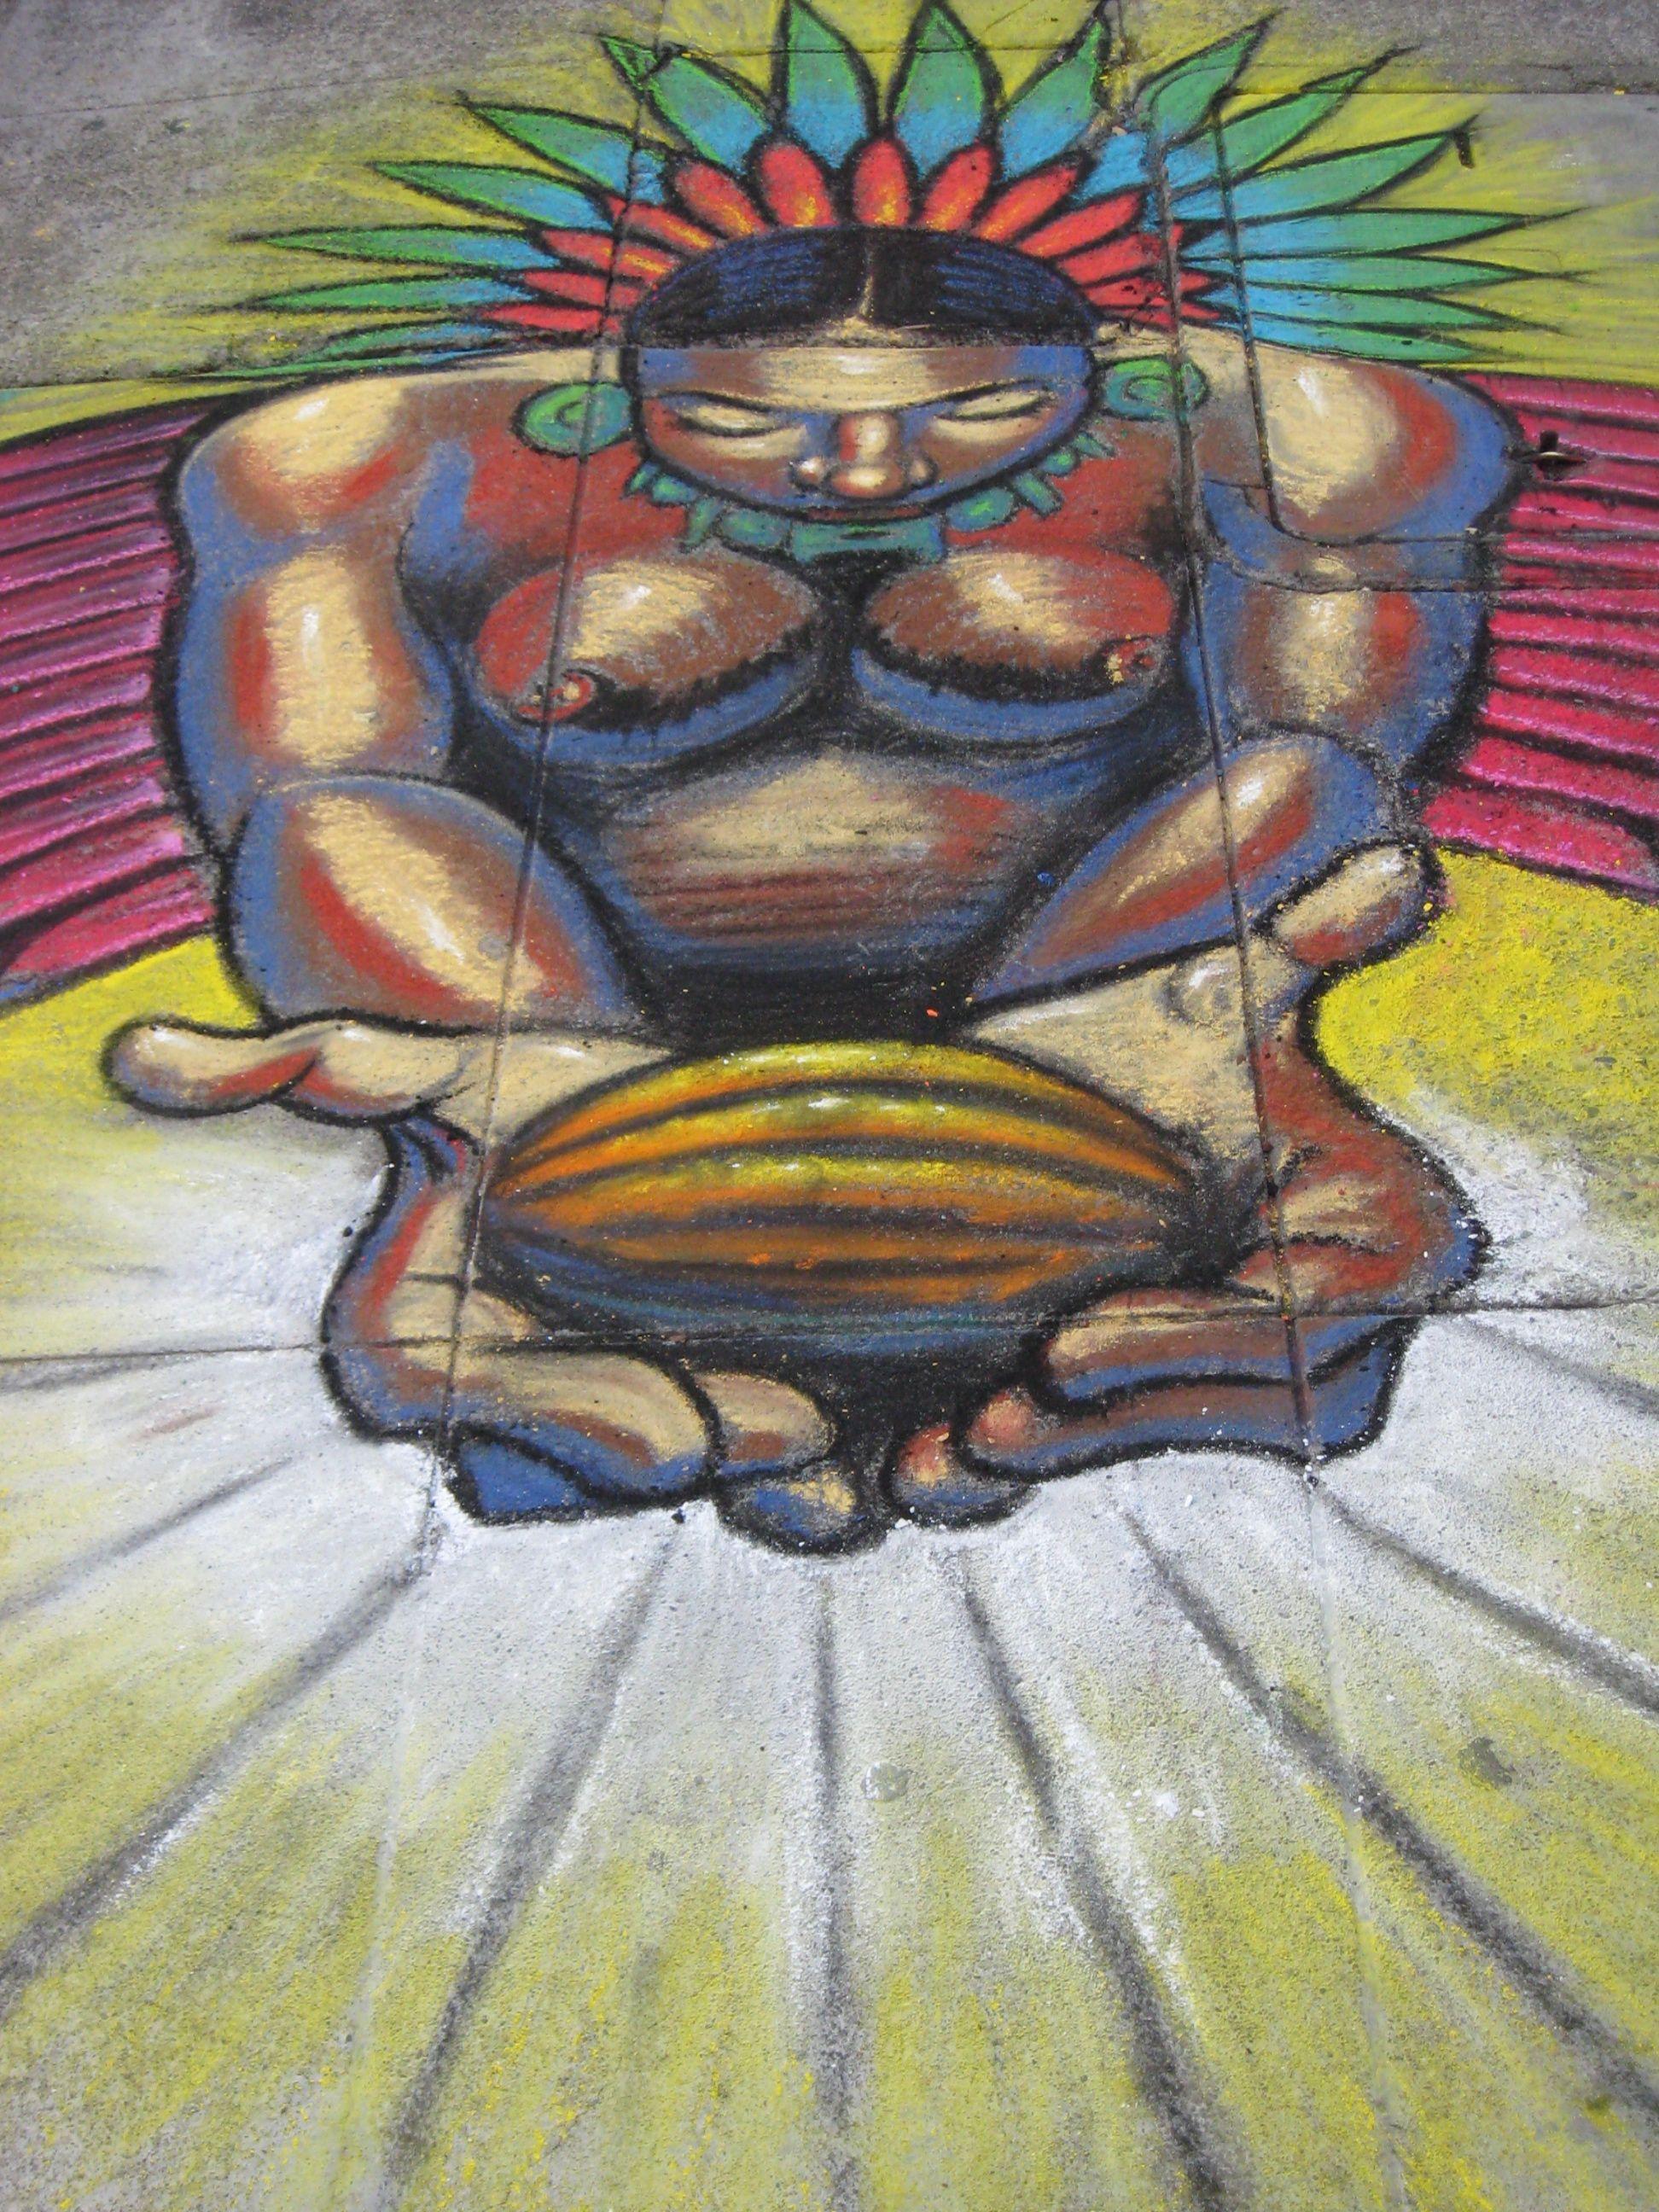 Aztec Chocolate God & Chalk Art Festival